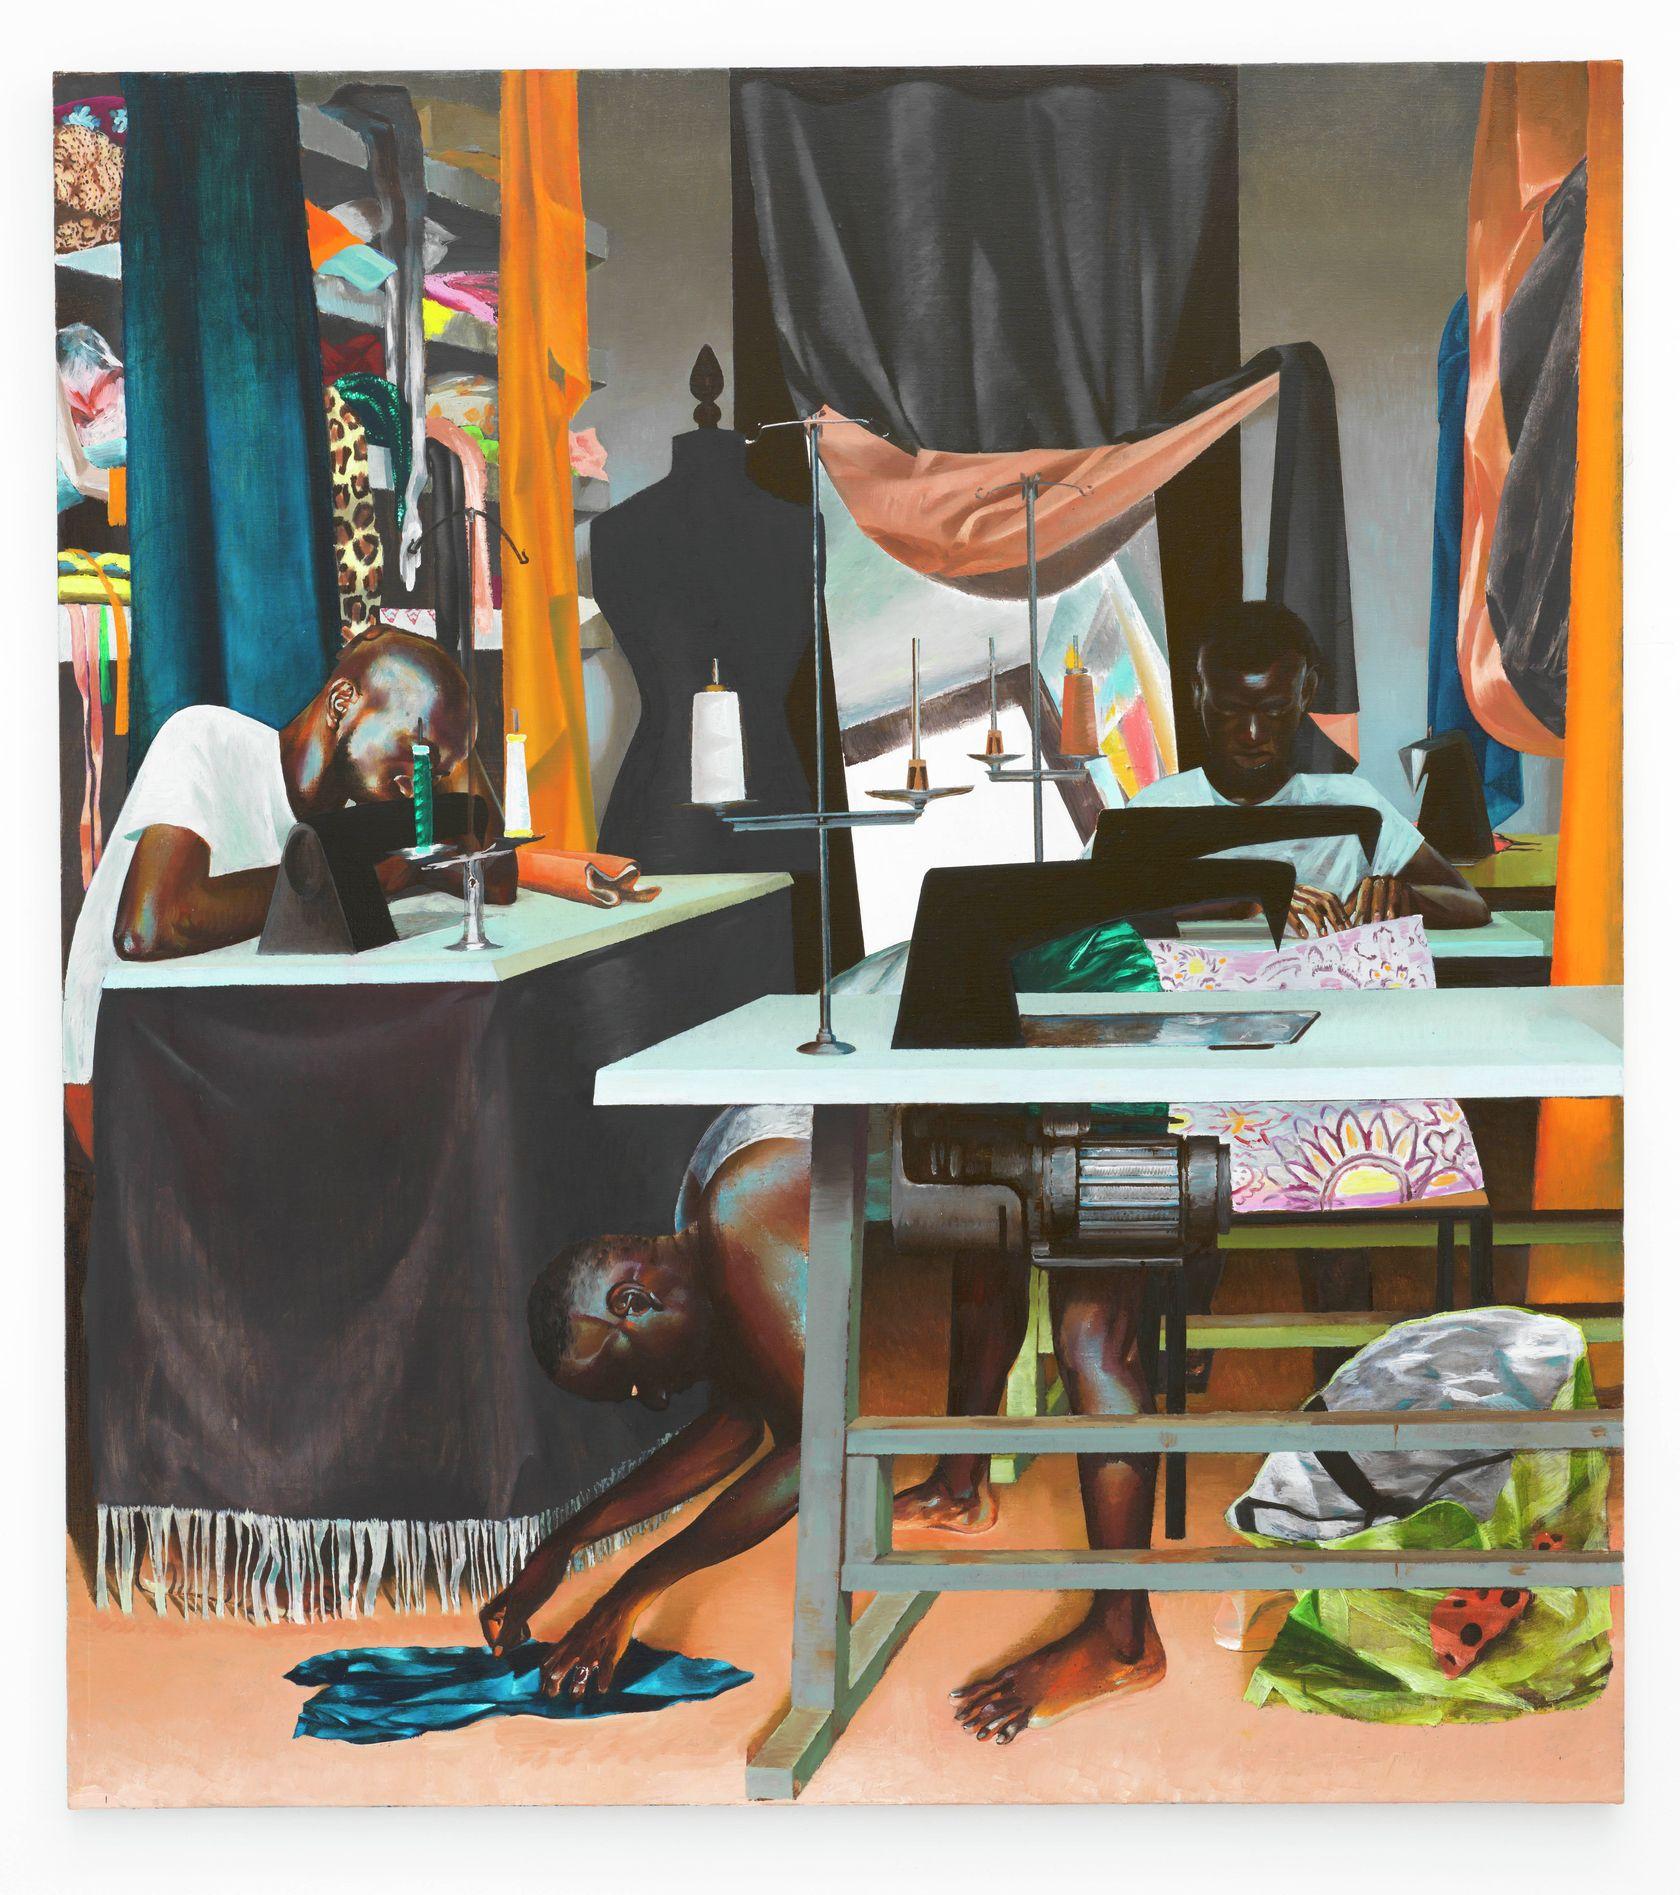 Laurent Proux, 5 rue Jean Robert, 2021 Huile sur toile200 × 180 cm / 78 6/8 × 70 7/8 in.